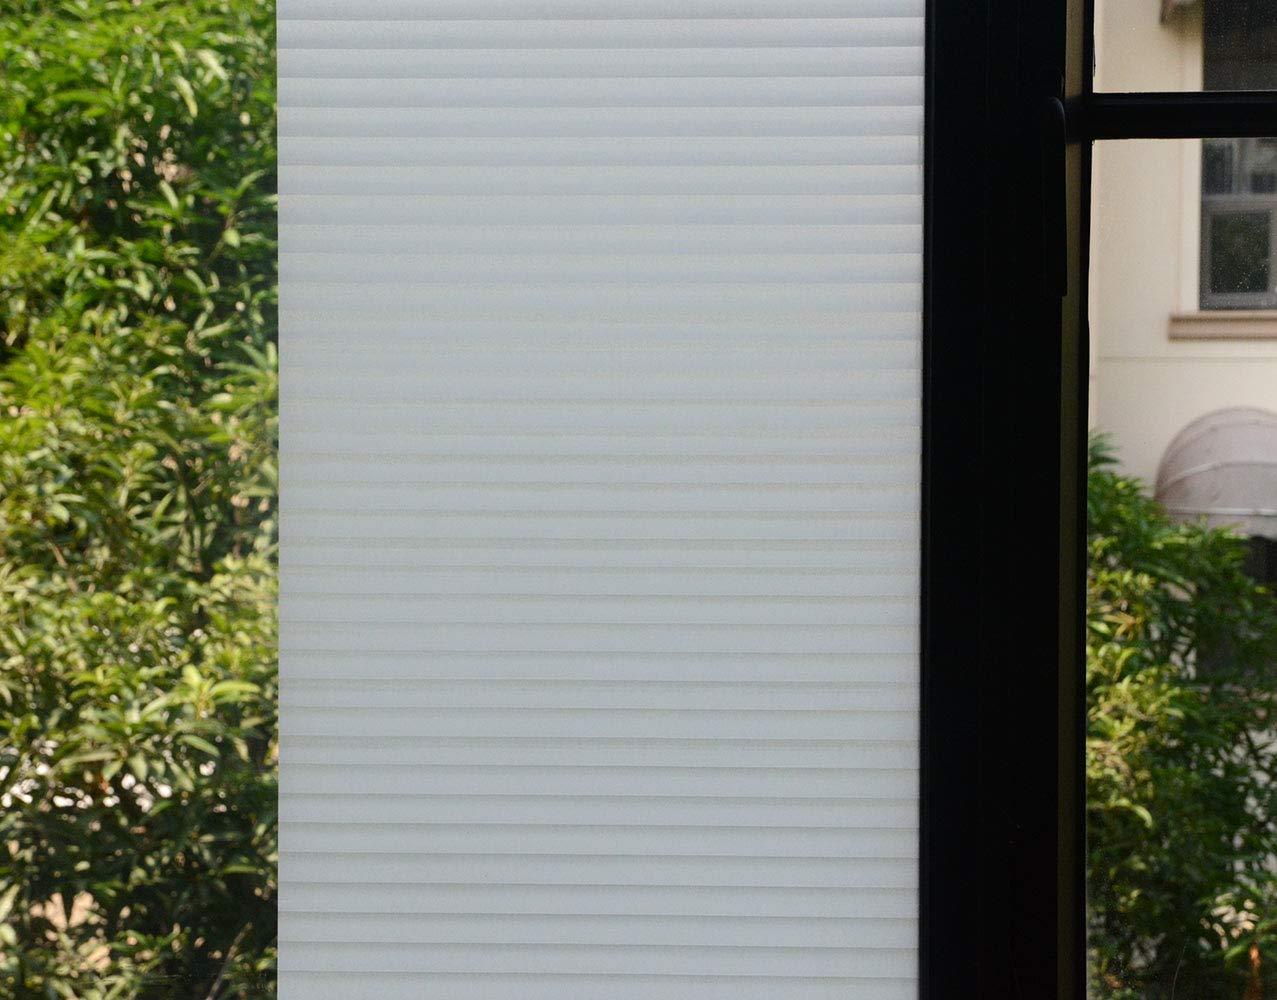 Anti-UV Window Tint for Living Bath Room//Kitchen//Front Door or Office 35.4 by 78.7// 90X200CM VSUTEK VSUDO Decorative Privacy Window Film No Glue Decor Static Cling Glass Sticker 1Roll, 35.4 by 78.7// 90X200CM, Blind